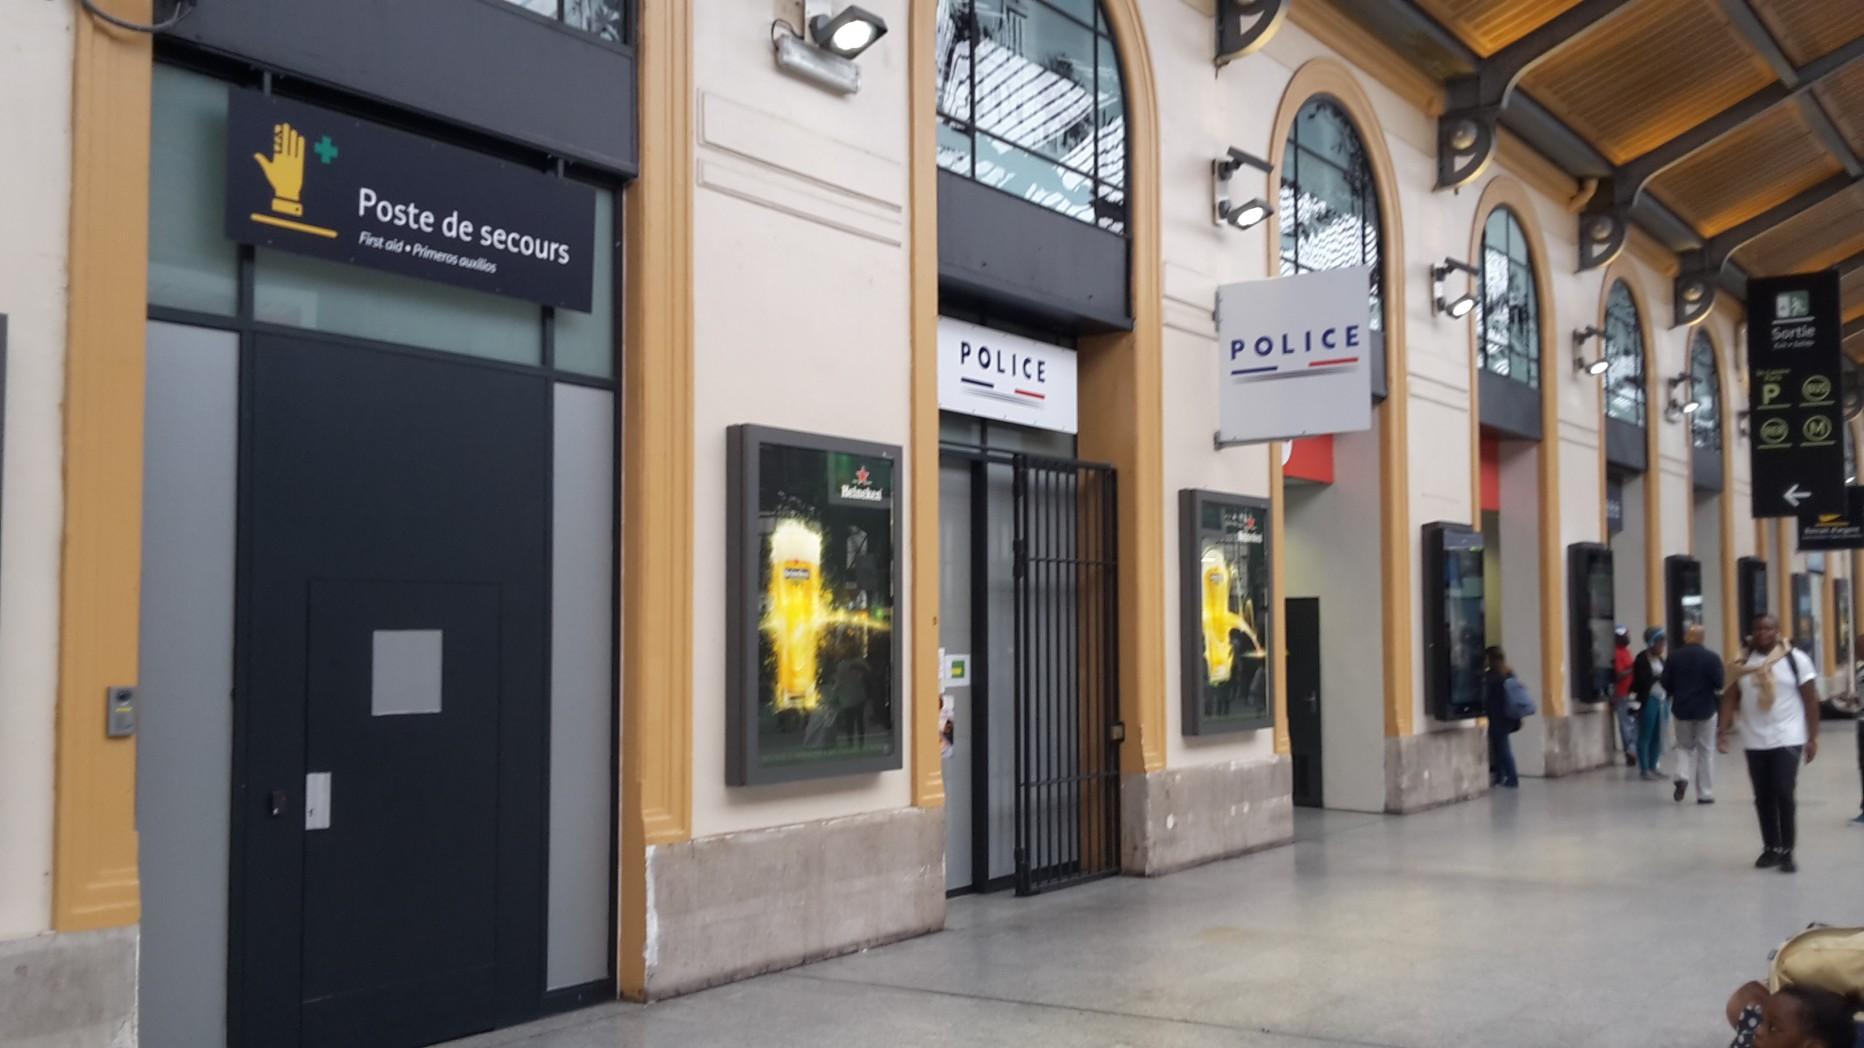 Commissariat de Police – Gare Saint-Lazare